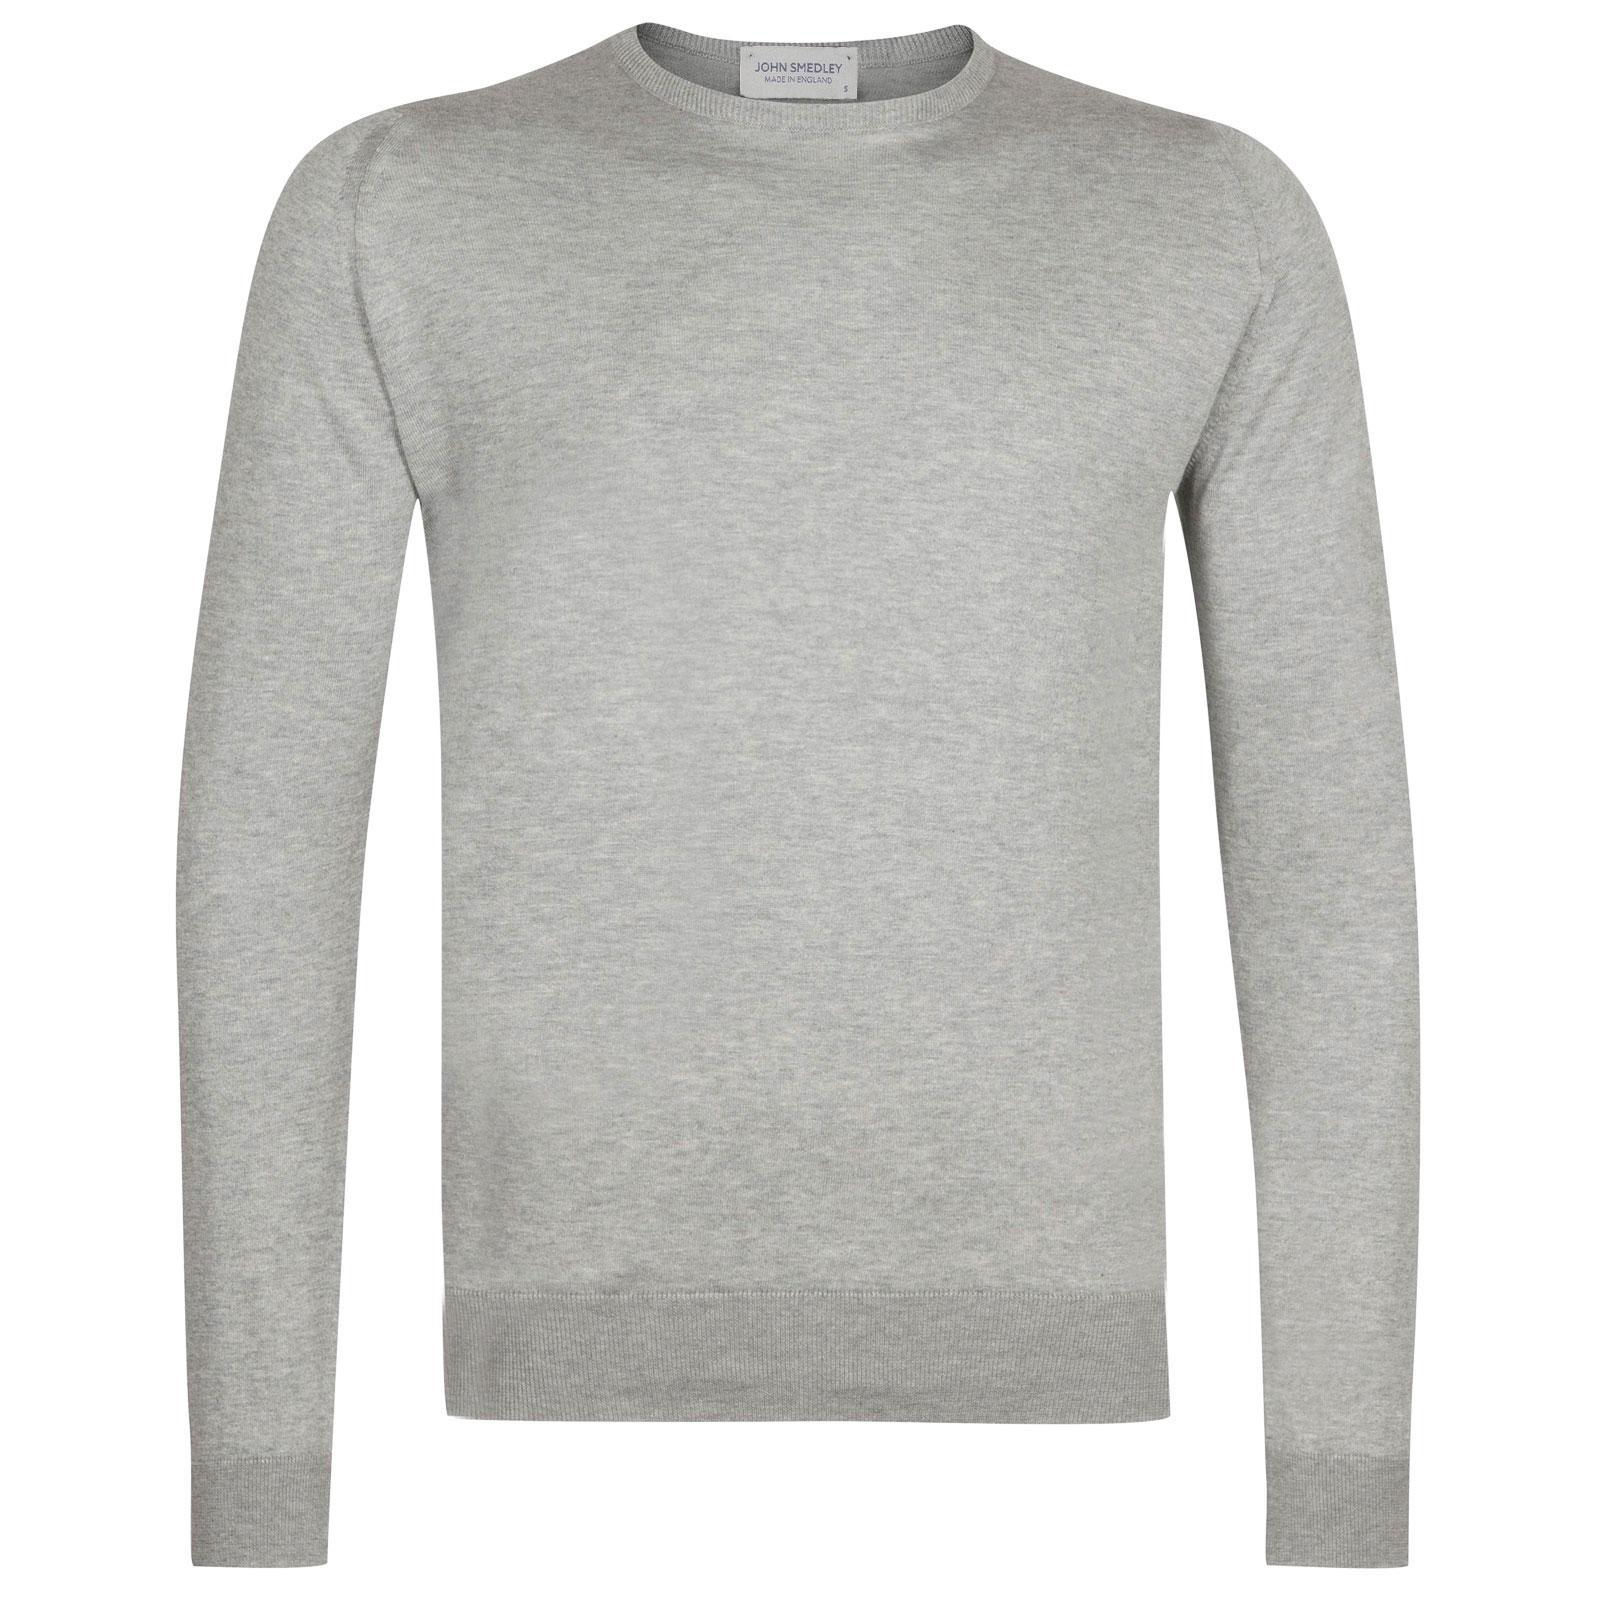 John Smedley hatfield Sea Island Cotton Pullover in Silver-XL